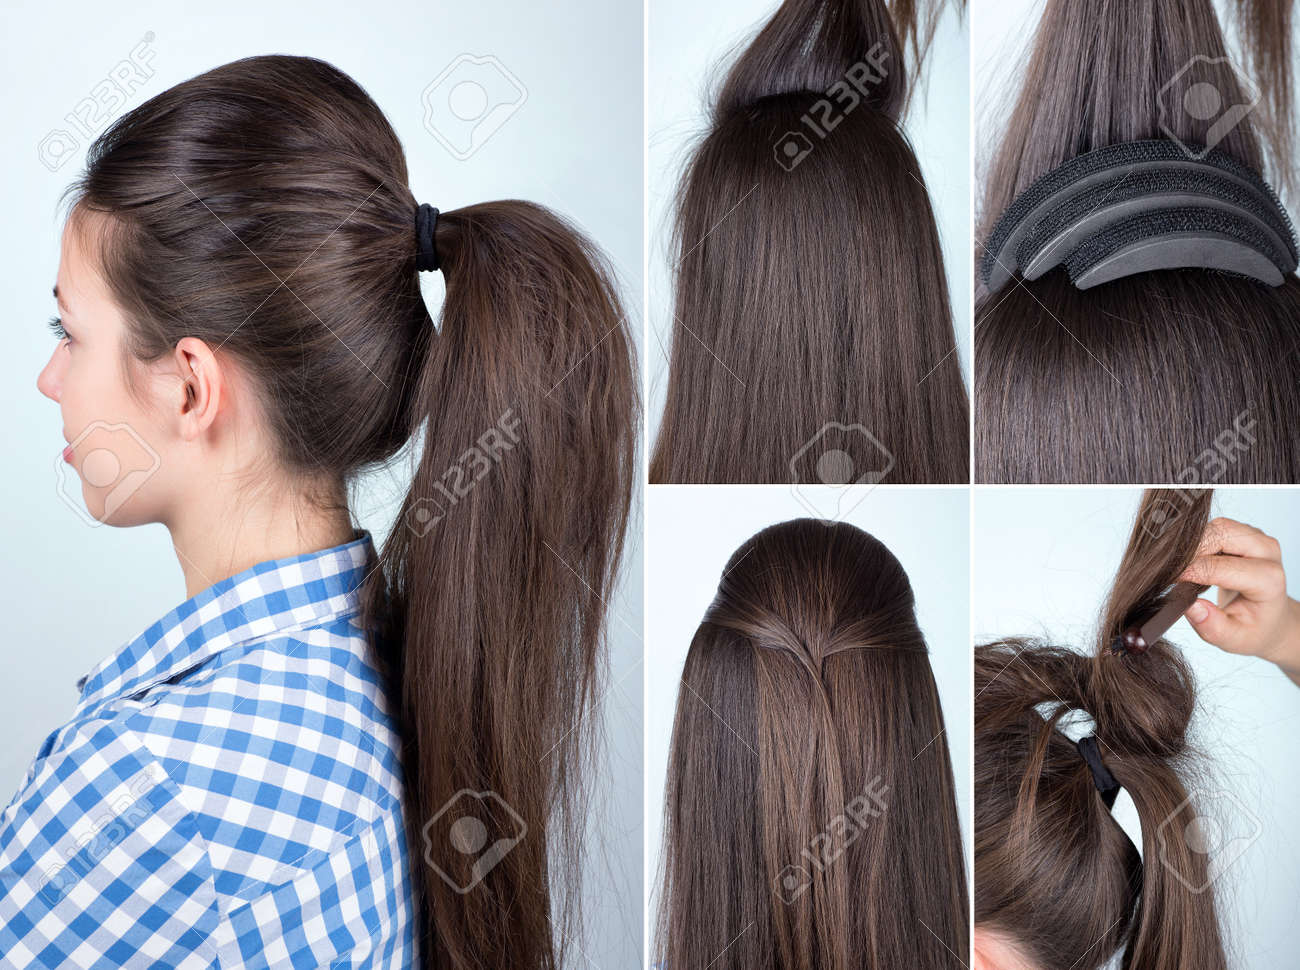 hairstyle volume ponytail tutorial - 71400786